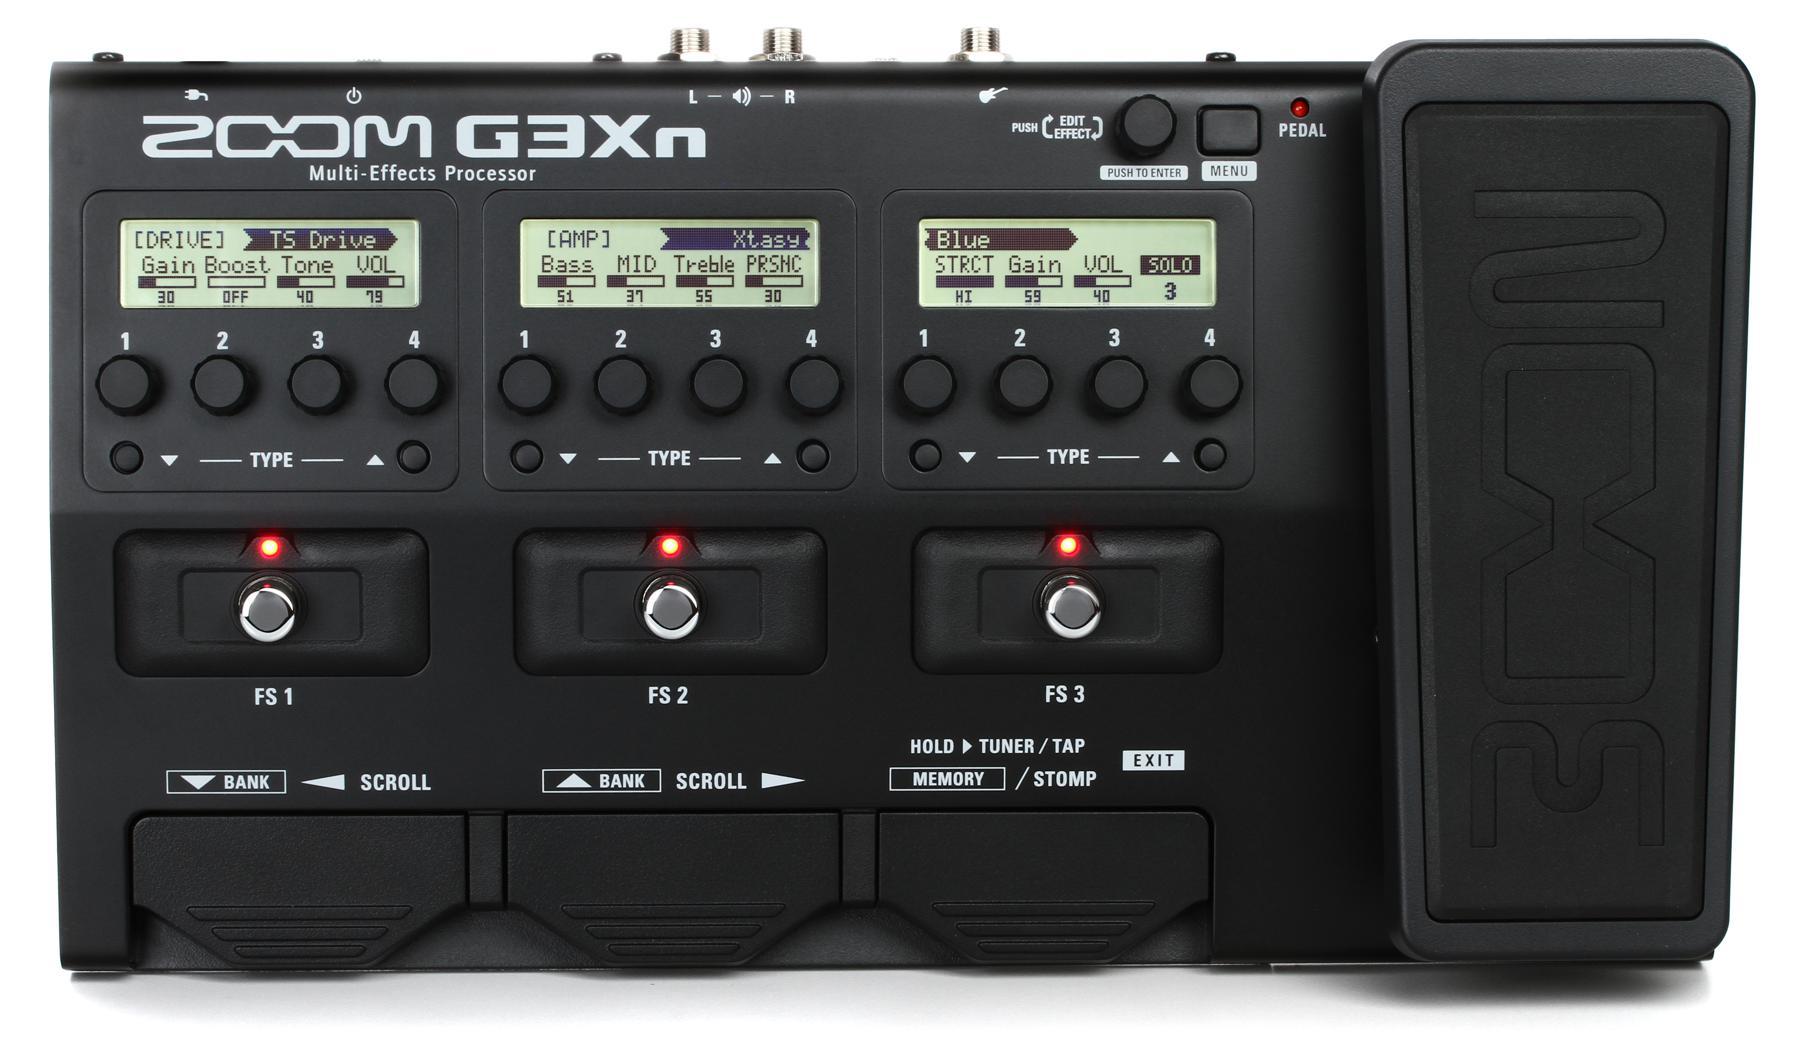 3. Zoom G3X